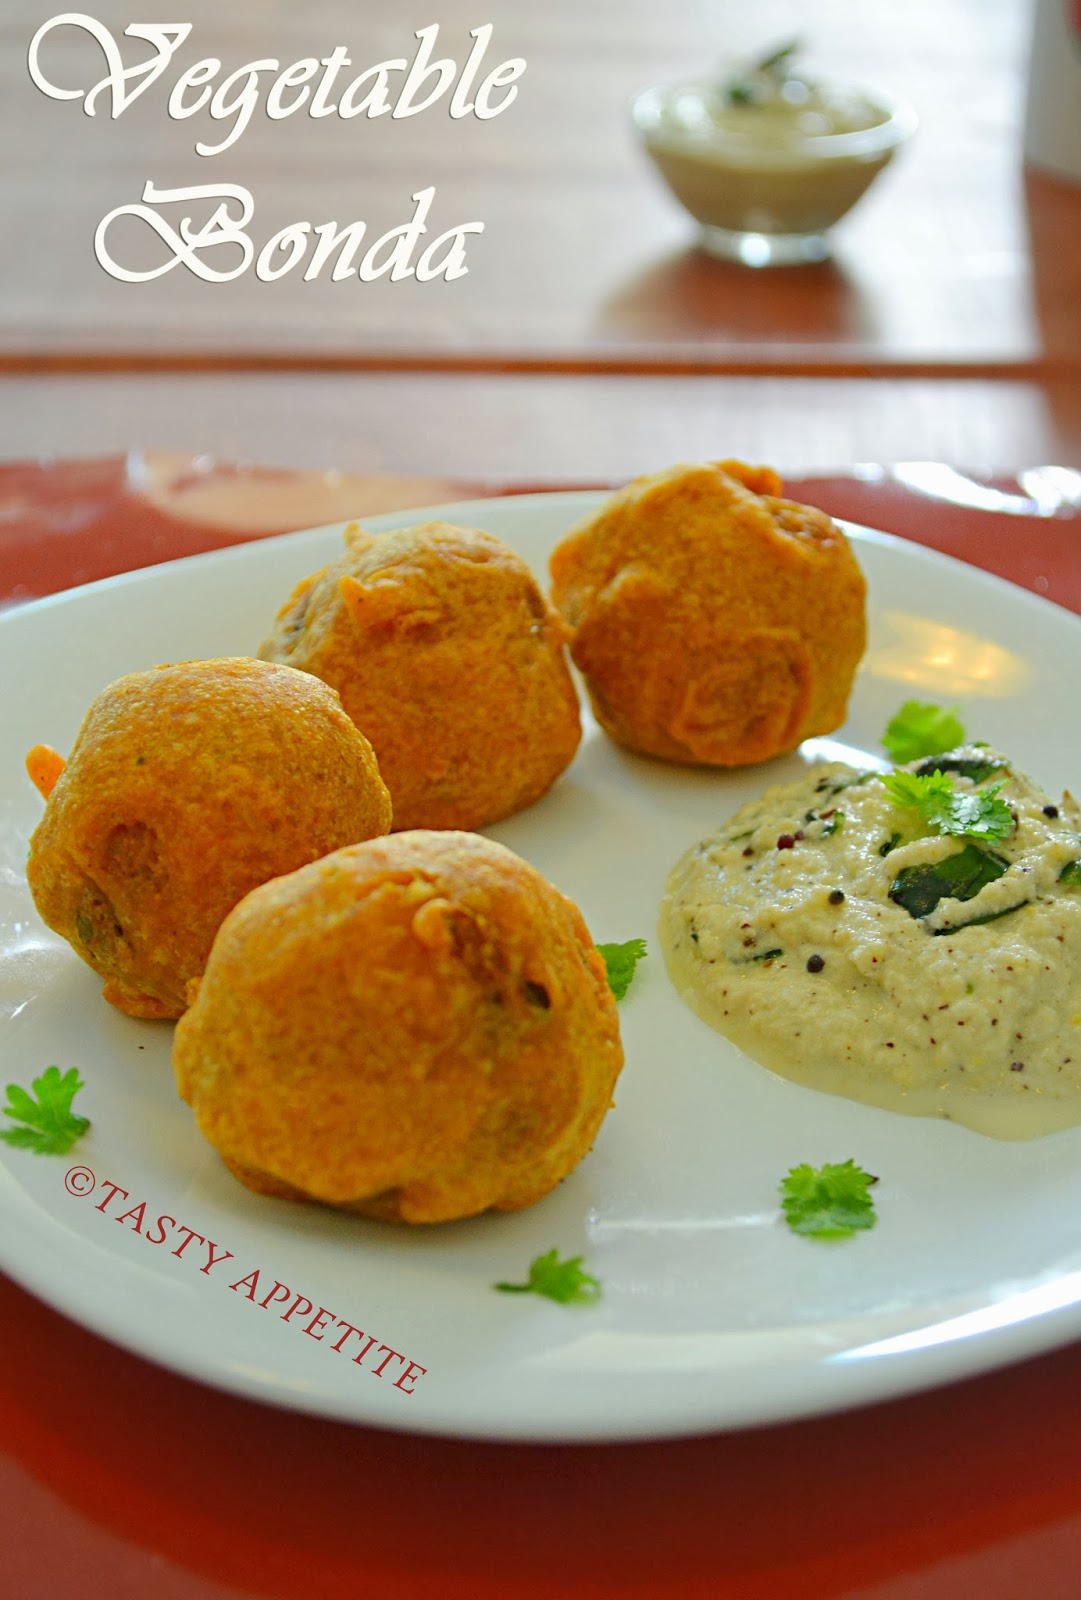 Vegetable bonda step by step recipe easy snacks recipes forumfinder Images